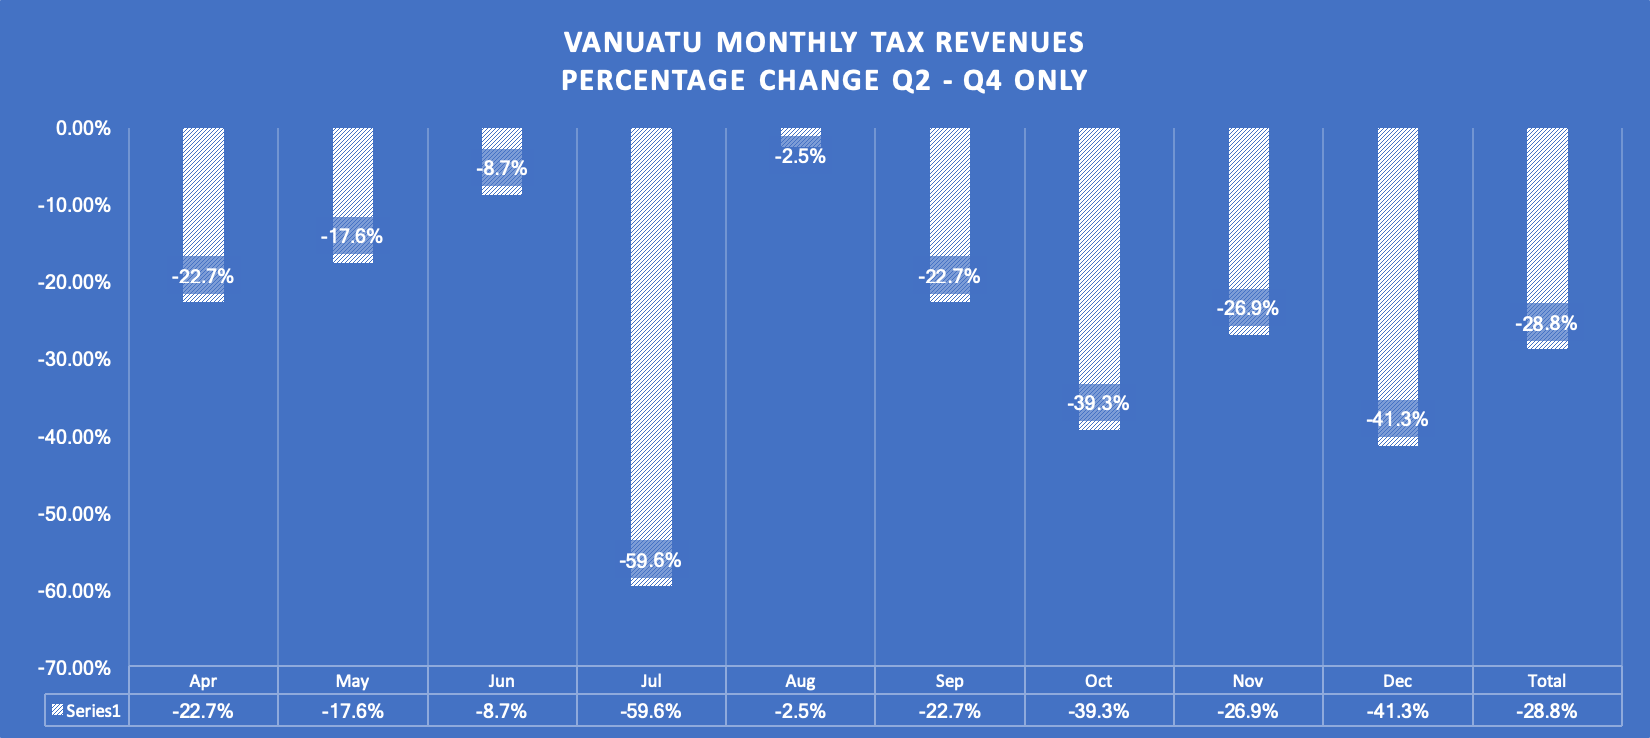 Vanuatu monthly tax revenues percentage change Q2 – Q4 only